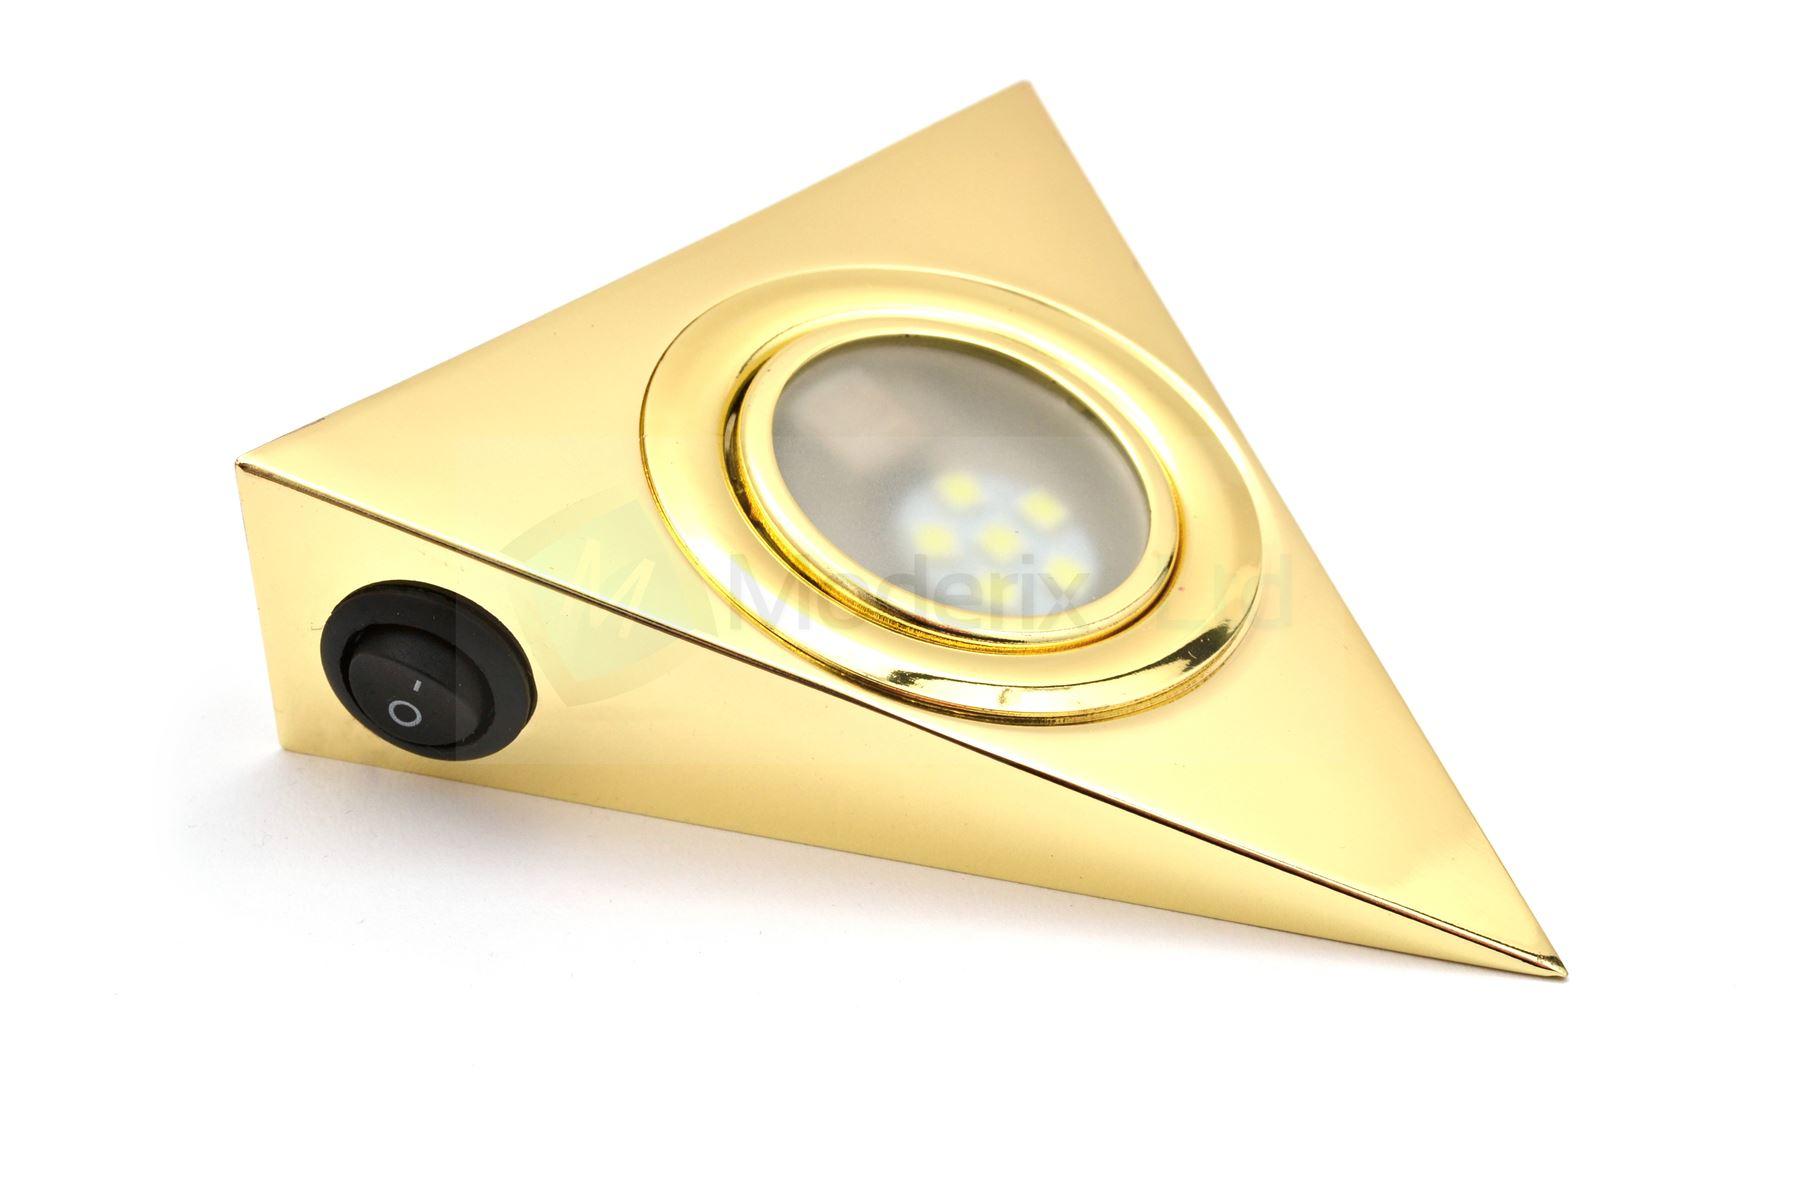 del triangle avec interrupteur or cuisine sous armoire lumi re set kit gtv ebay. Black Bedroom Furniture Sets. Home Design Ideas